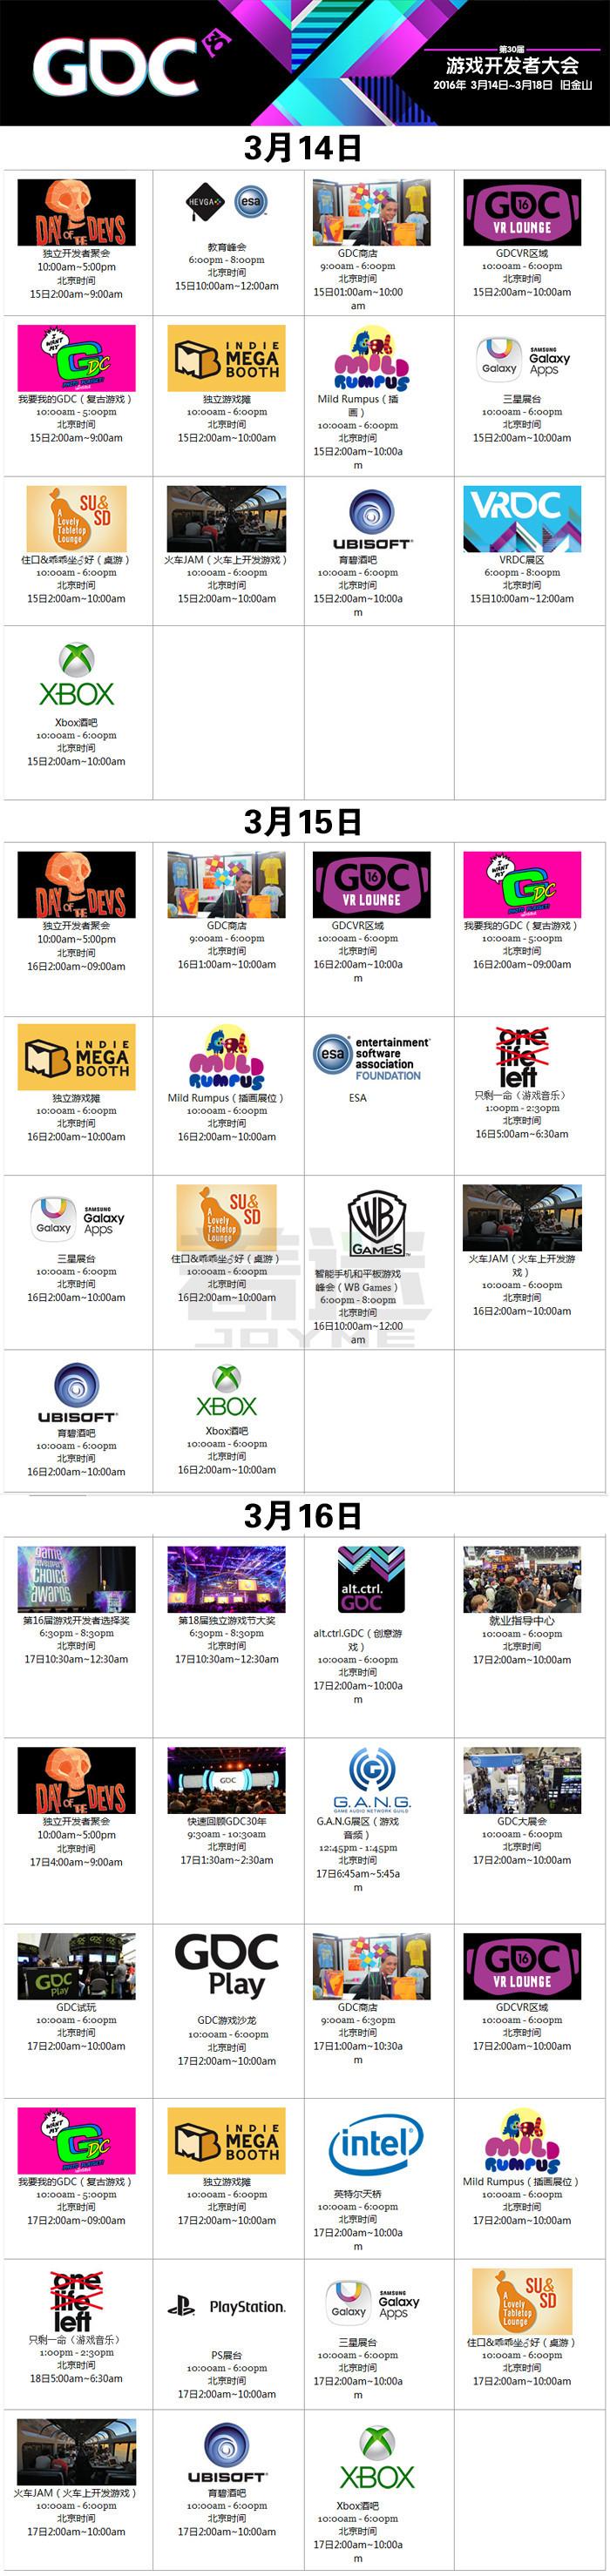 GDC具体日程,GDC峰会日程,GDC2016,